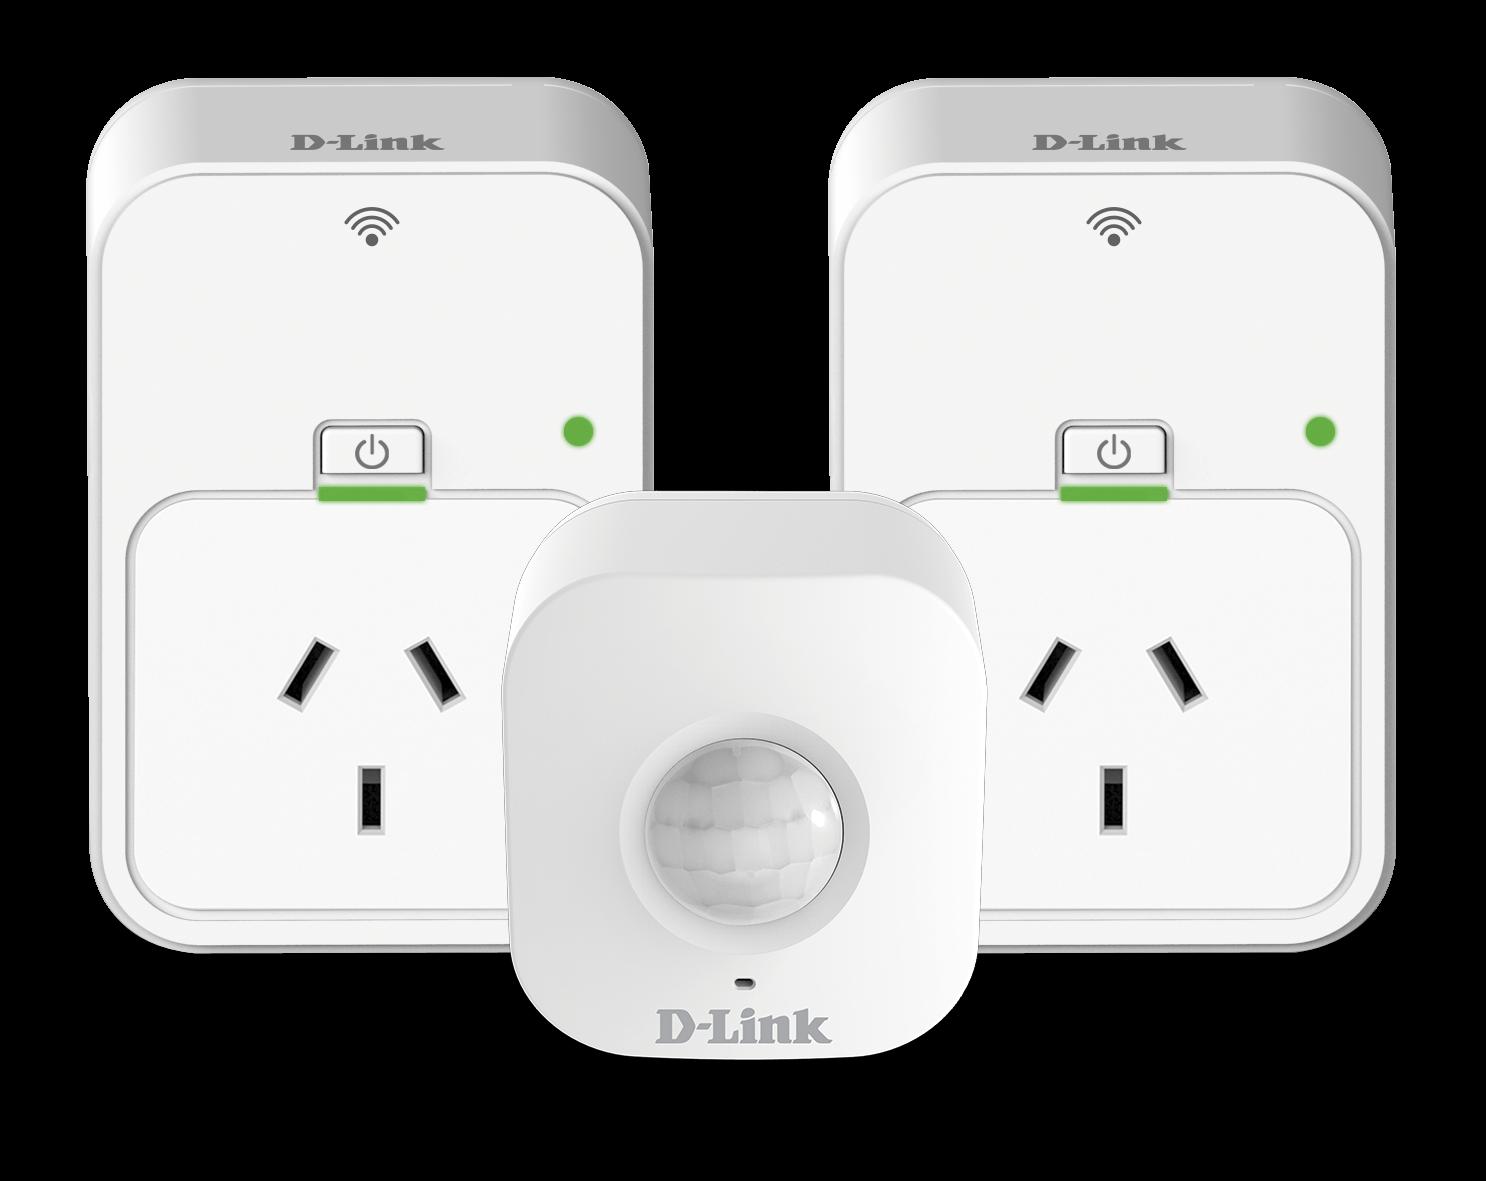 Wi Fi Smart Plugs Australian Power Cords Electrical Plug And